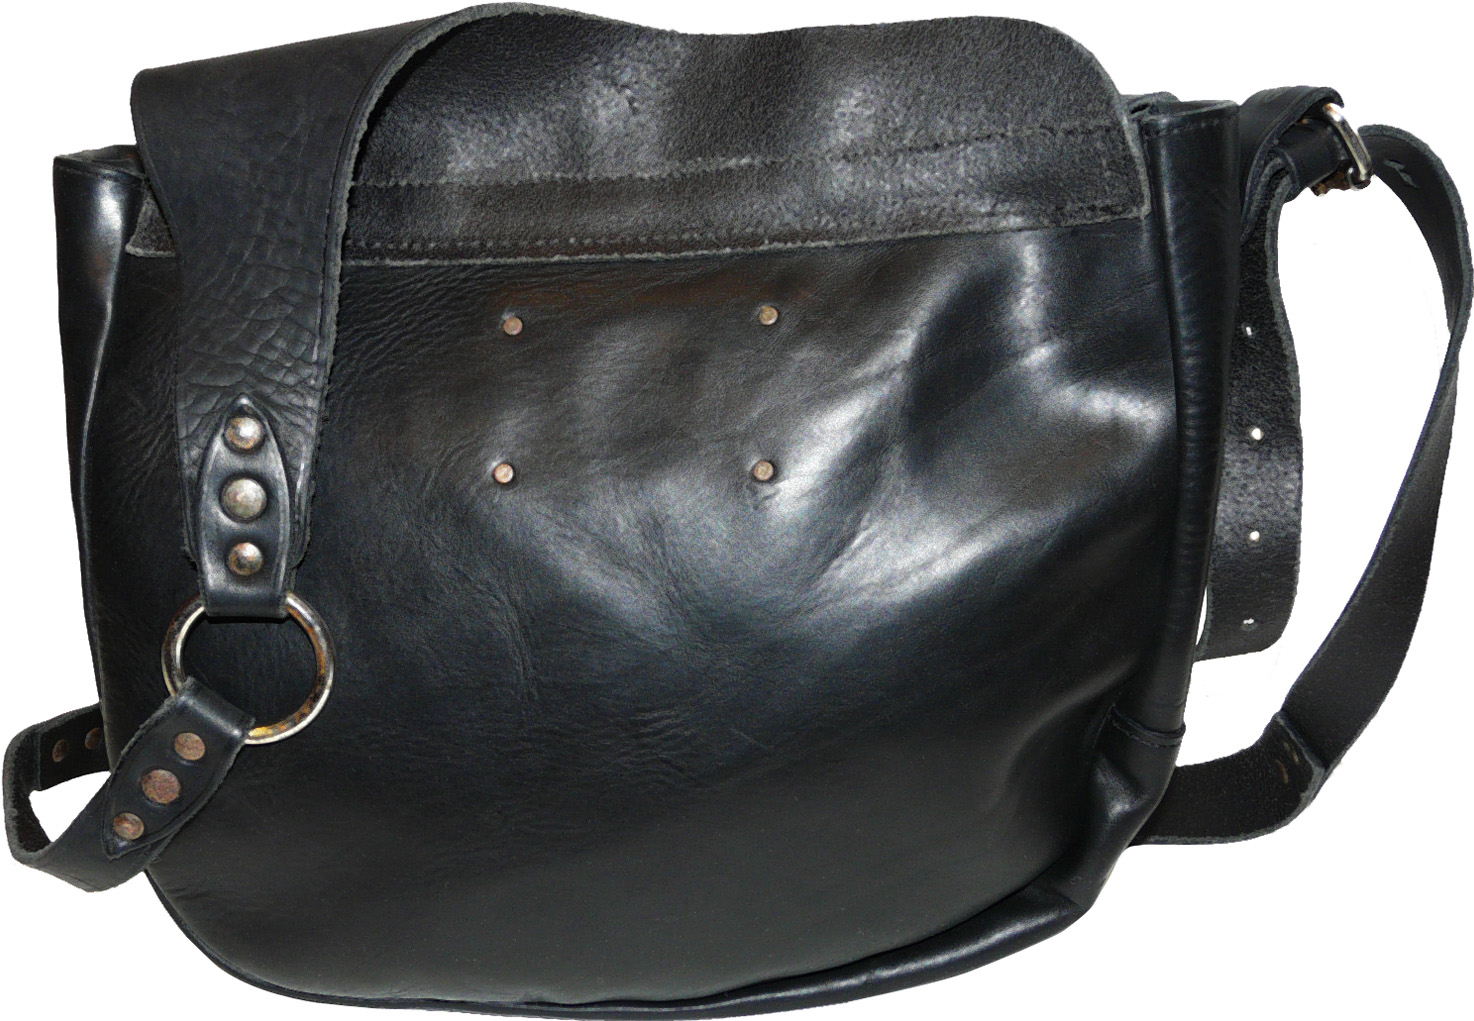 Altamont Bag 2.jpg